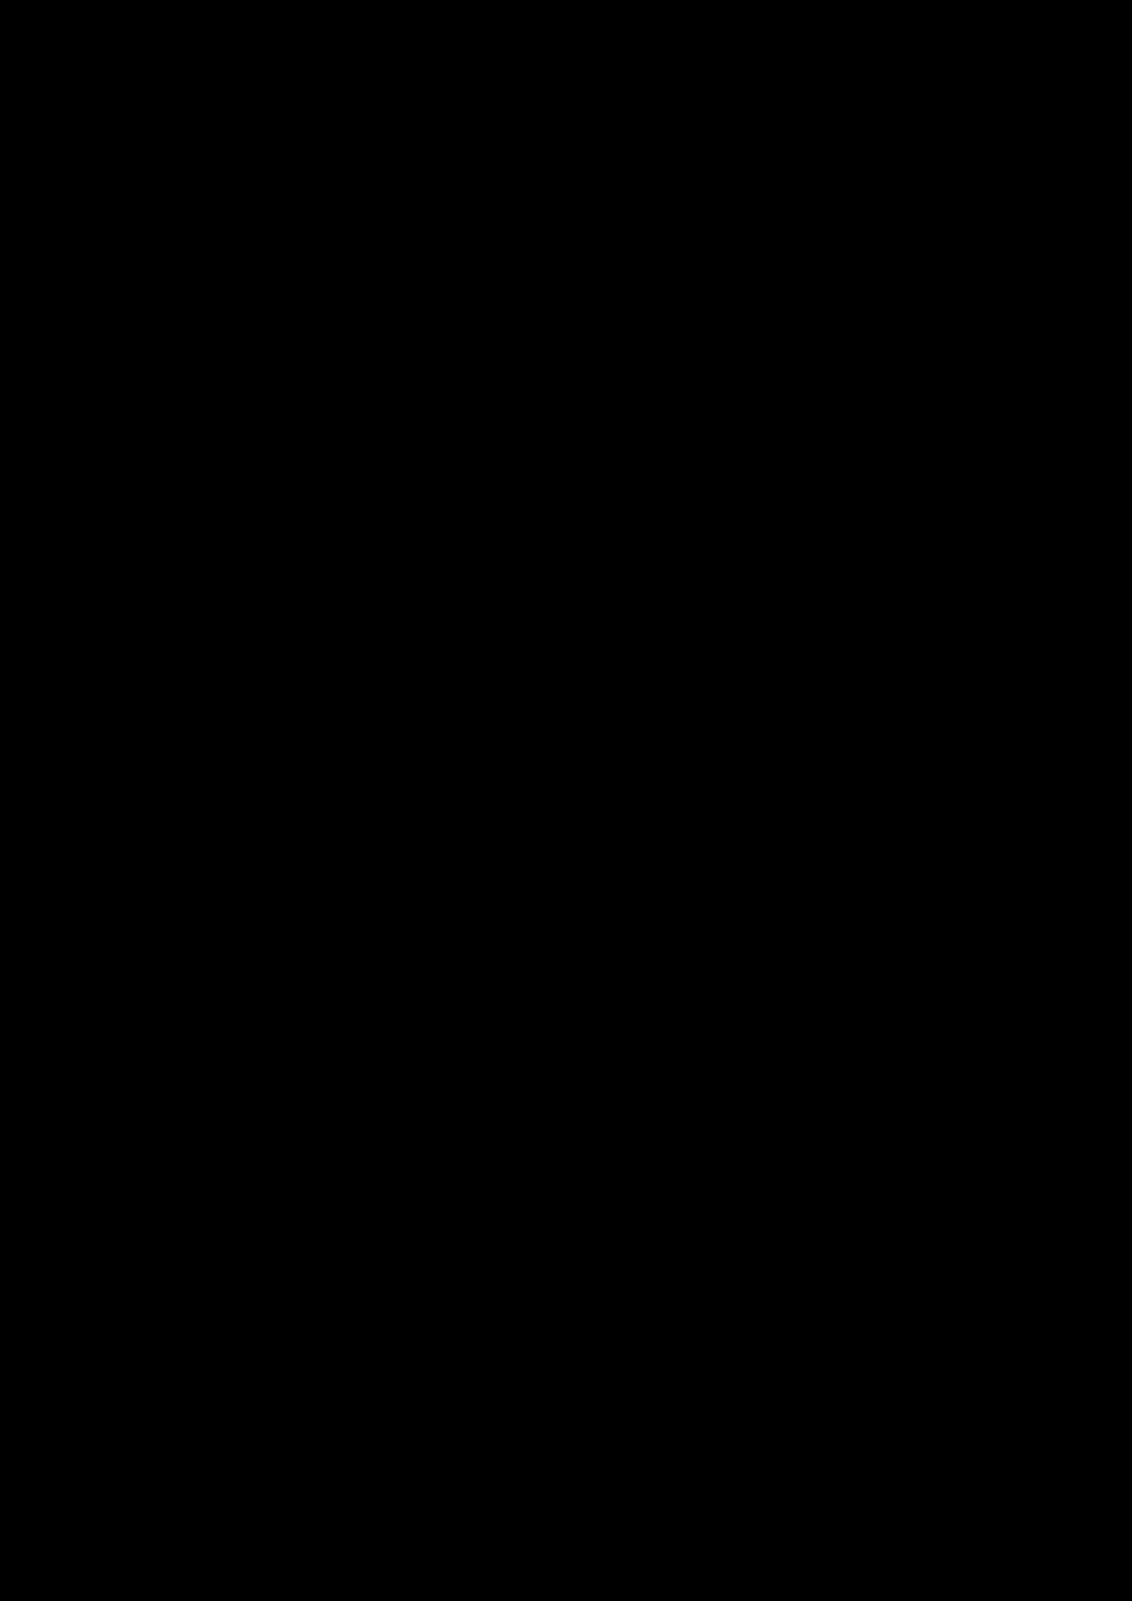 Ispoved Pervogo Boga slide, Image 30